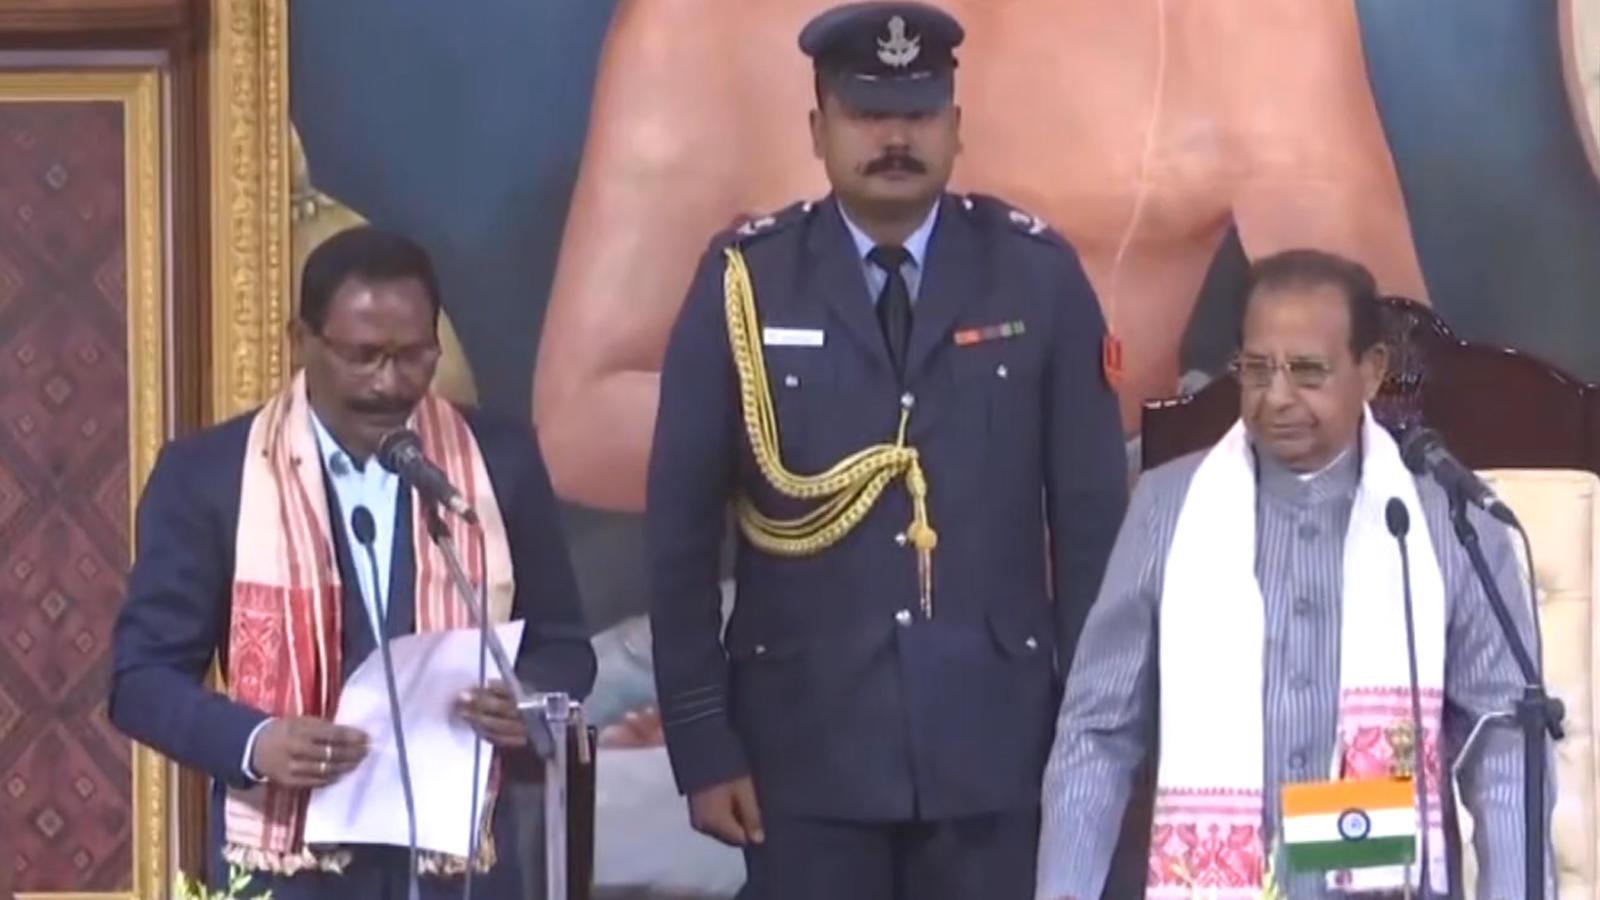 assam-cabinet-expansion-jogen-mohan-sanjay-kishan-take-oath-as-ministers